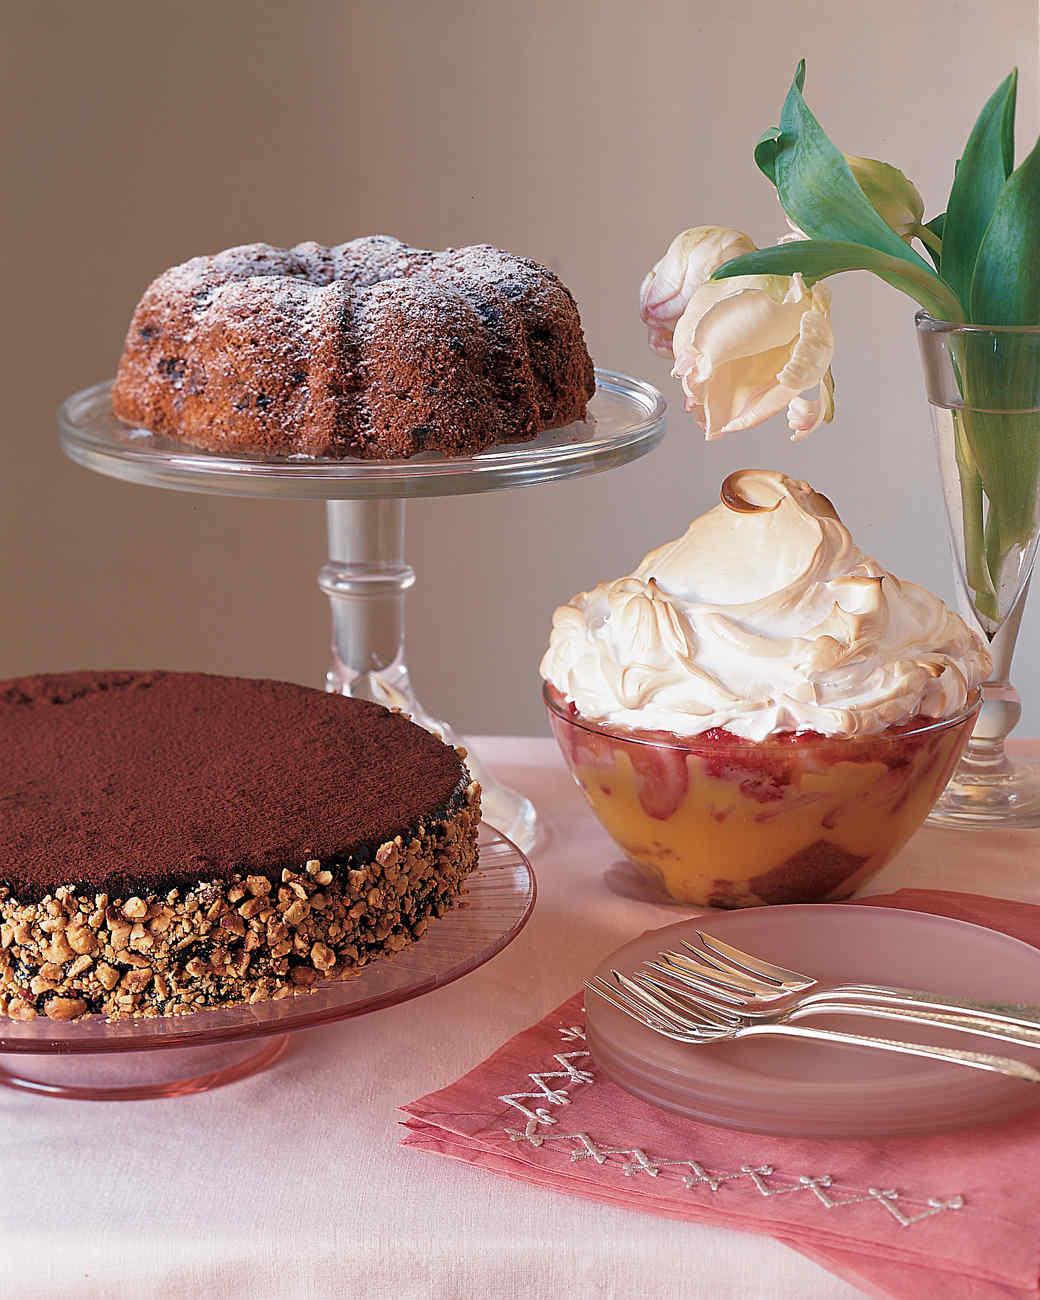 Passover Sponge Cake  Passover Sponge Cake